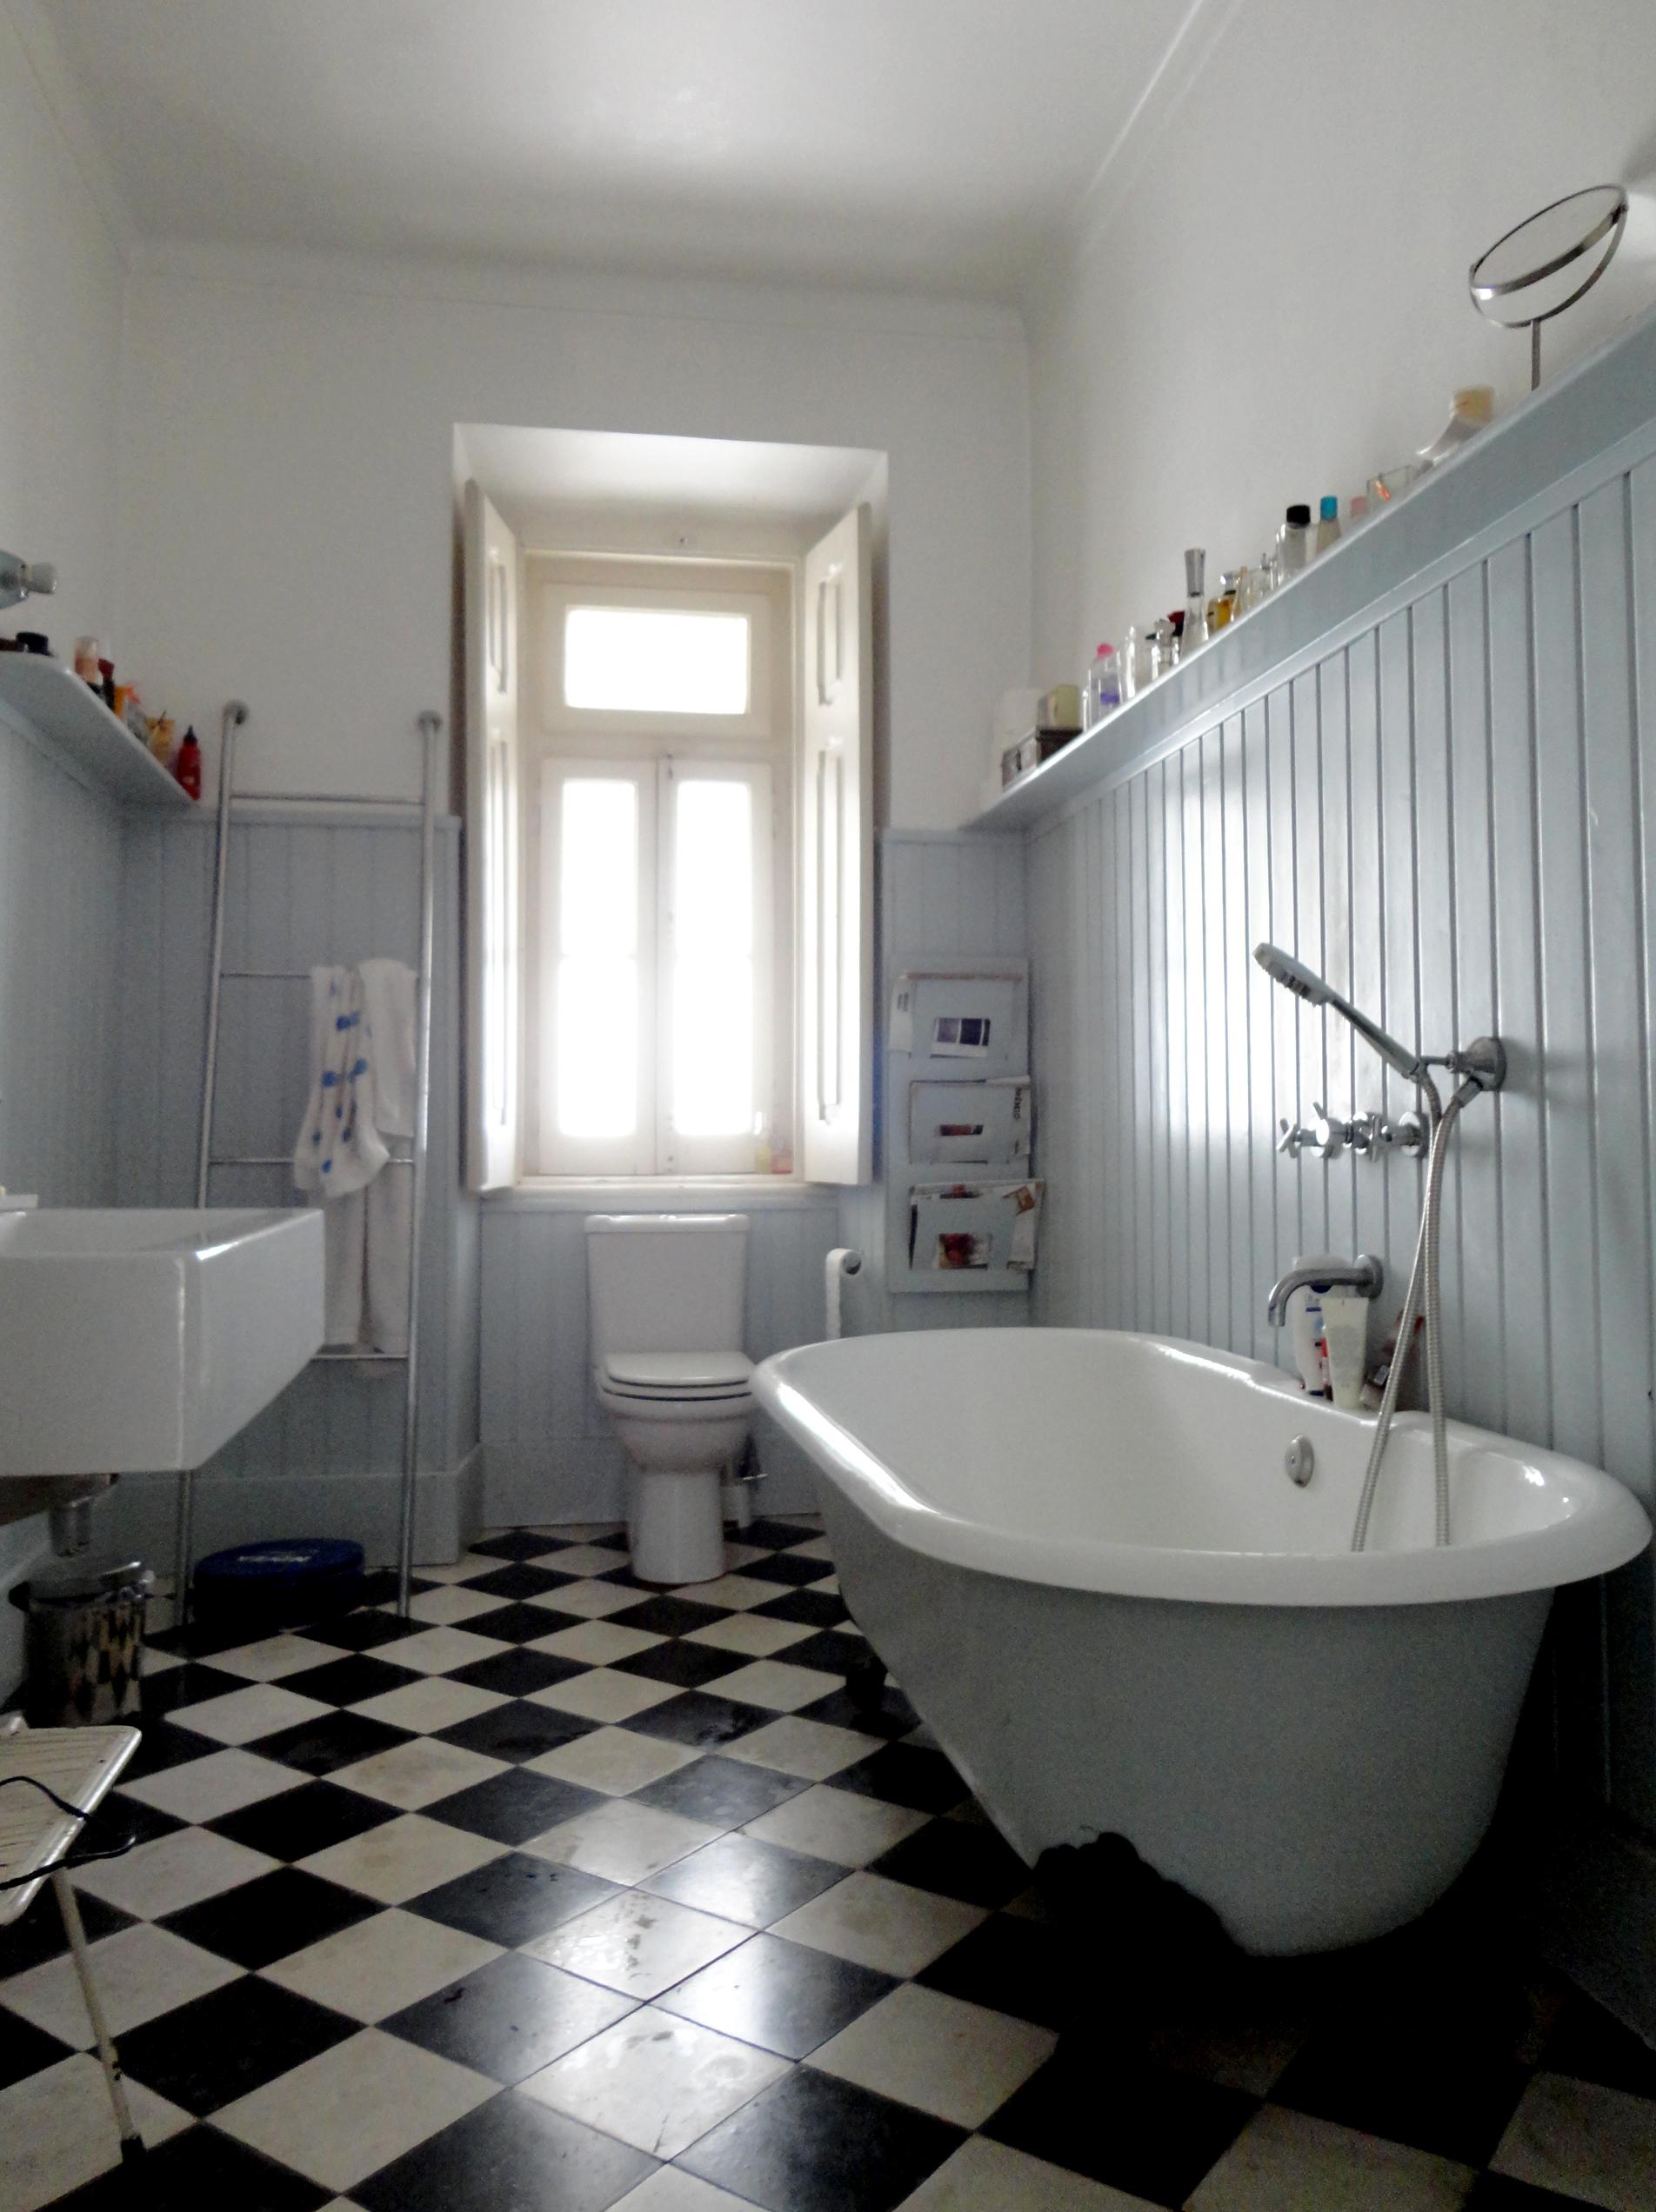 2 wc.jpg